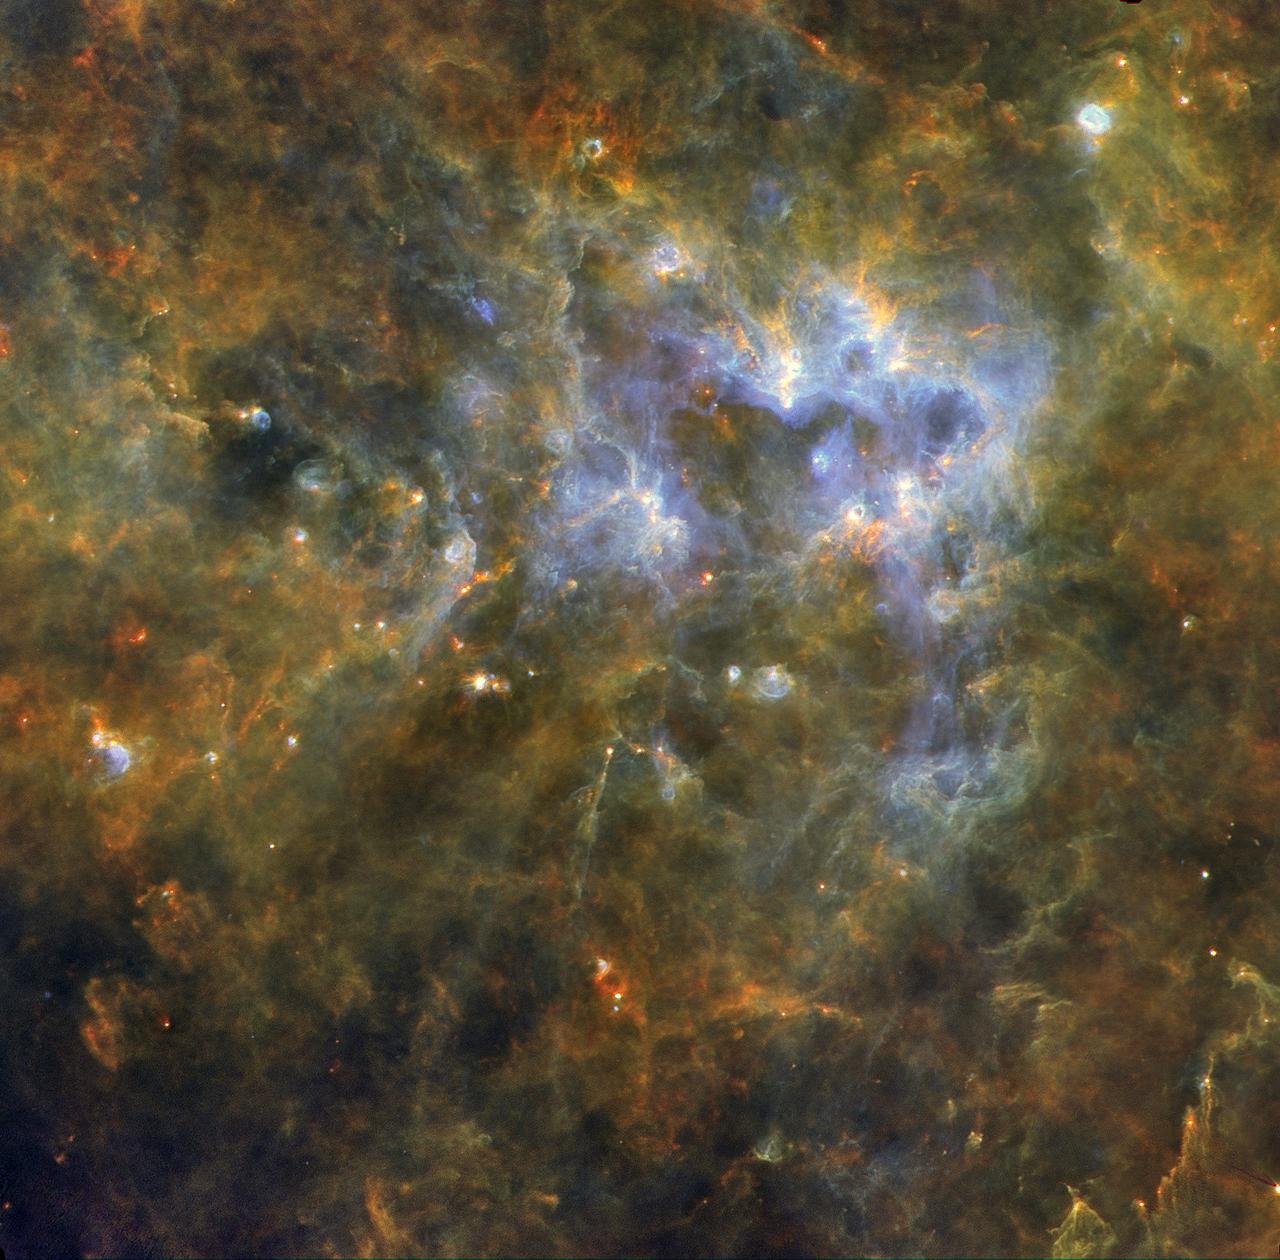 1567214676018-Herschel_Hidden_secrets_of_a_massive_star-formation_region_1280.jpg